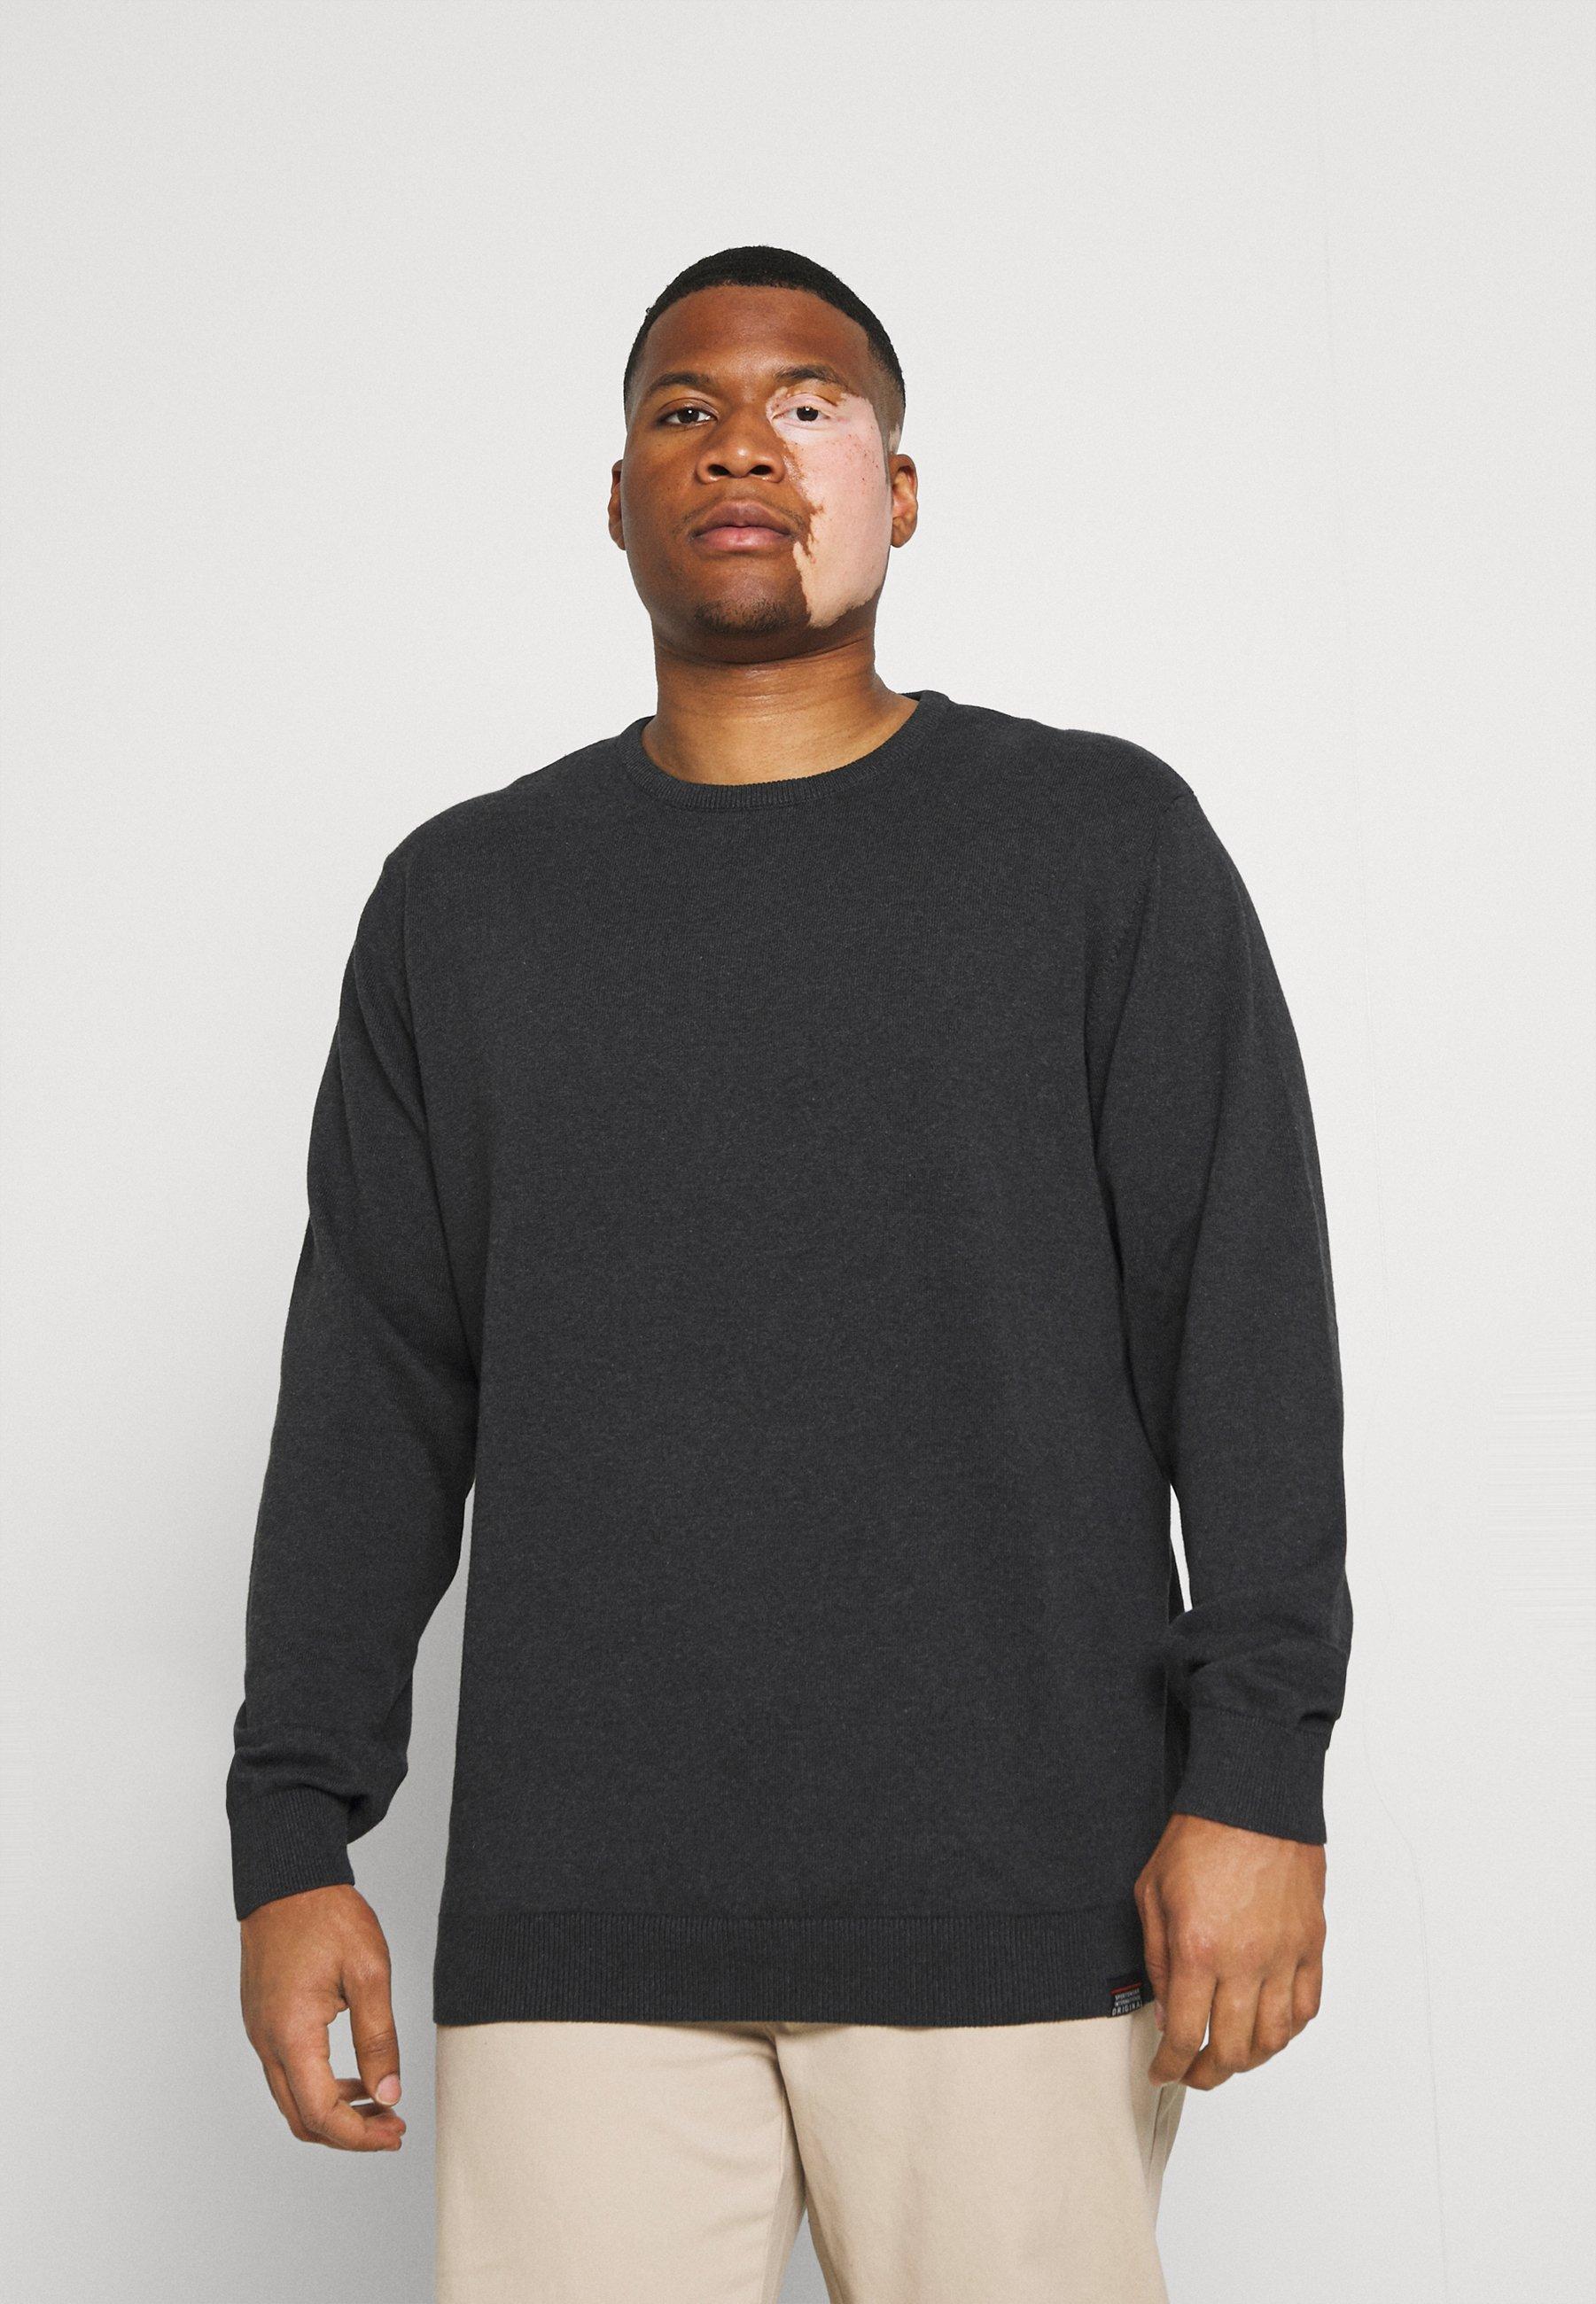 Homme PLAIN O NECK COMFORT FIT - Pullover